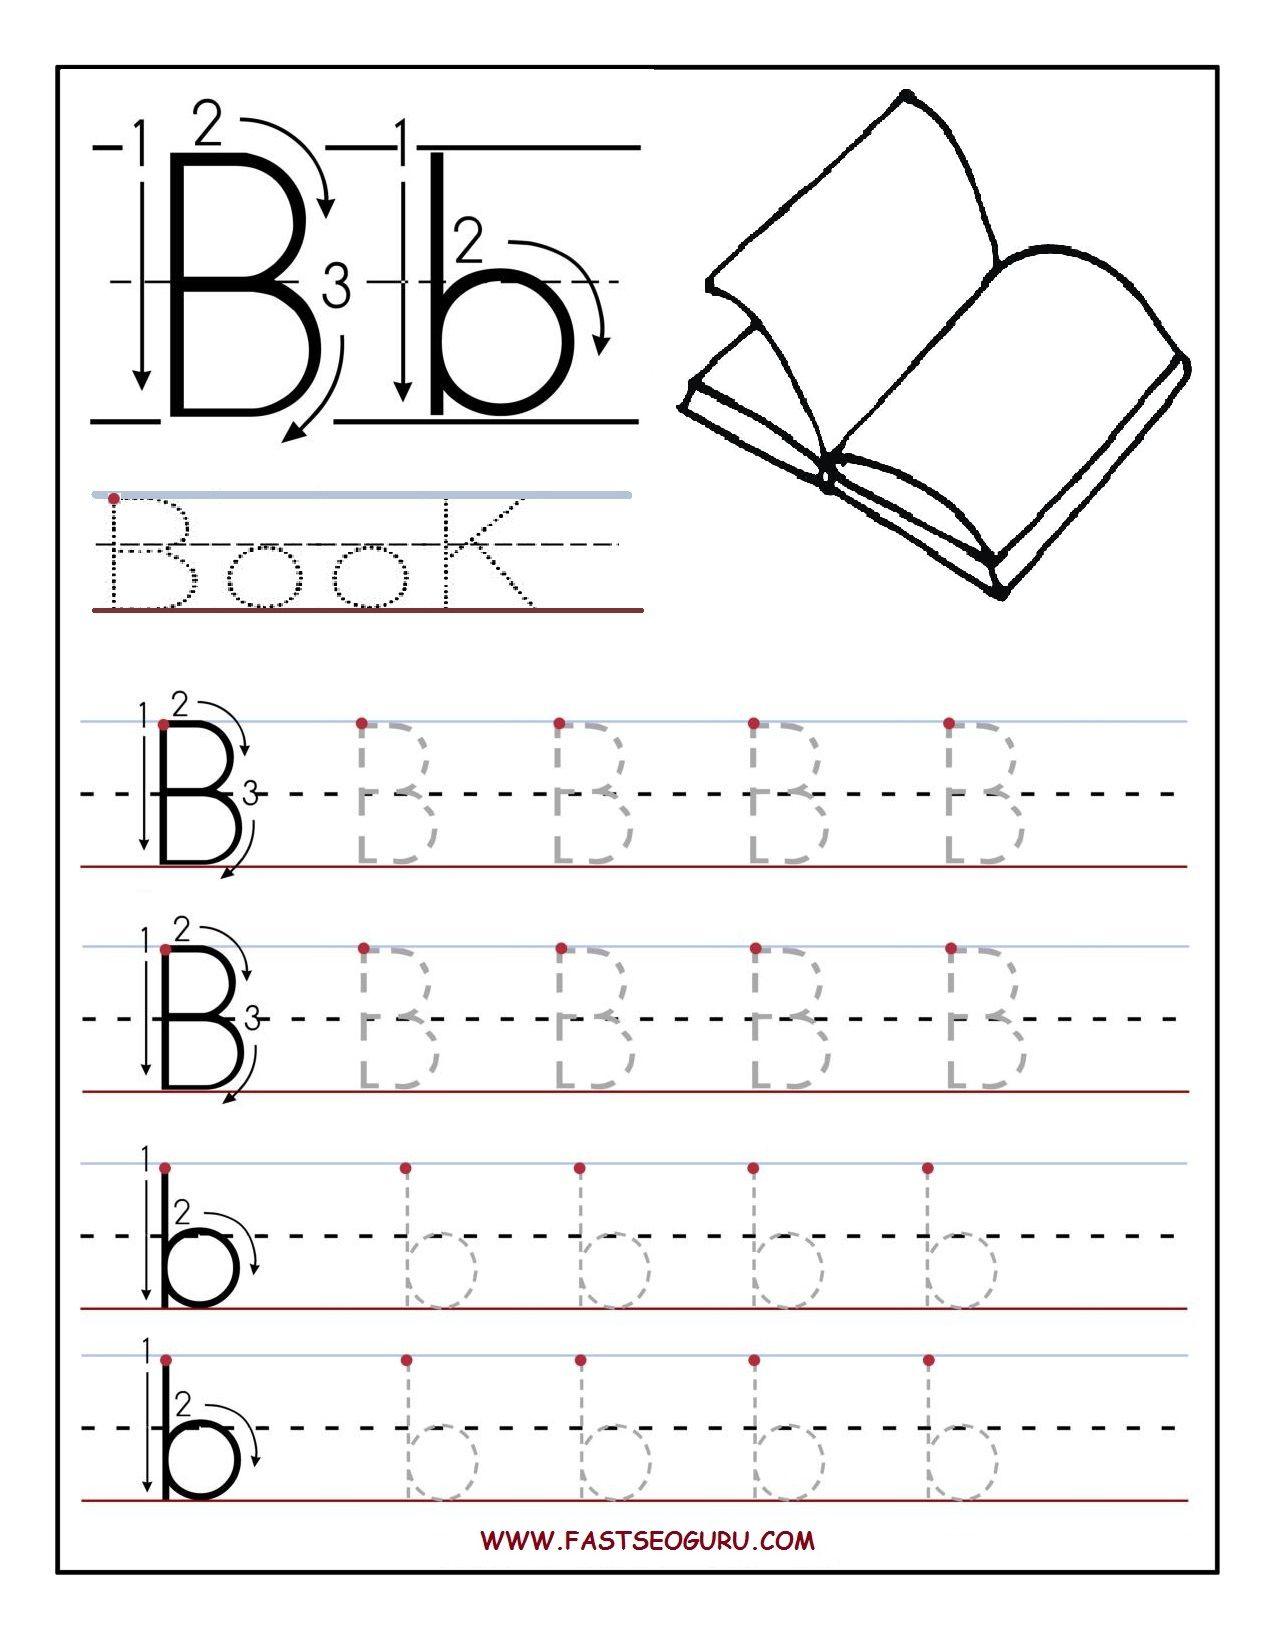 Letter B Worksheets For Preschoolers | Printable Letter B